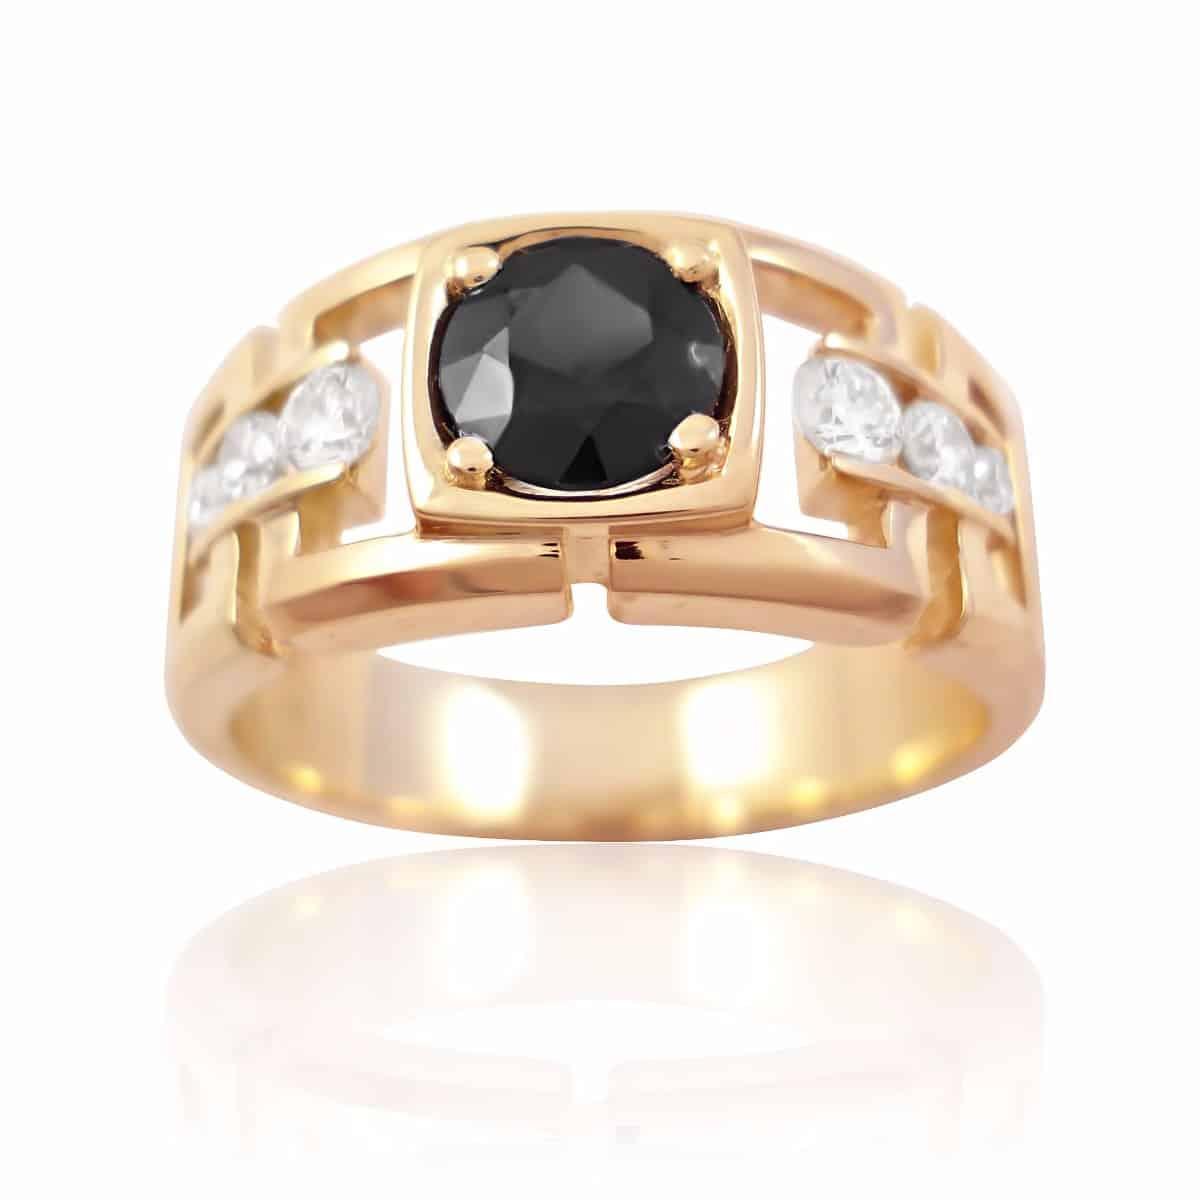 Бриллиант в мужском кольце